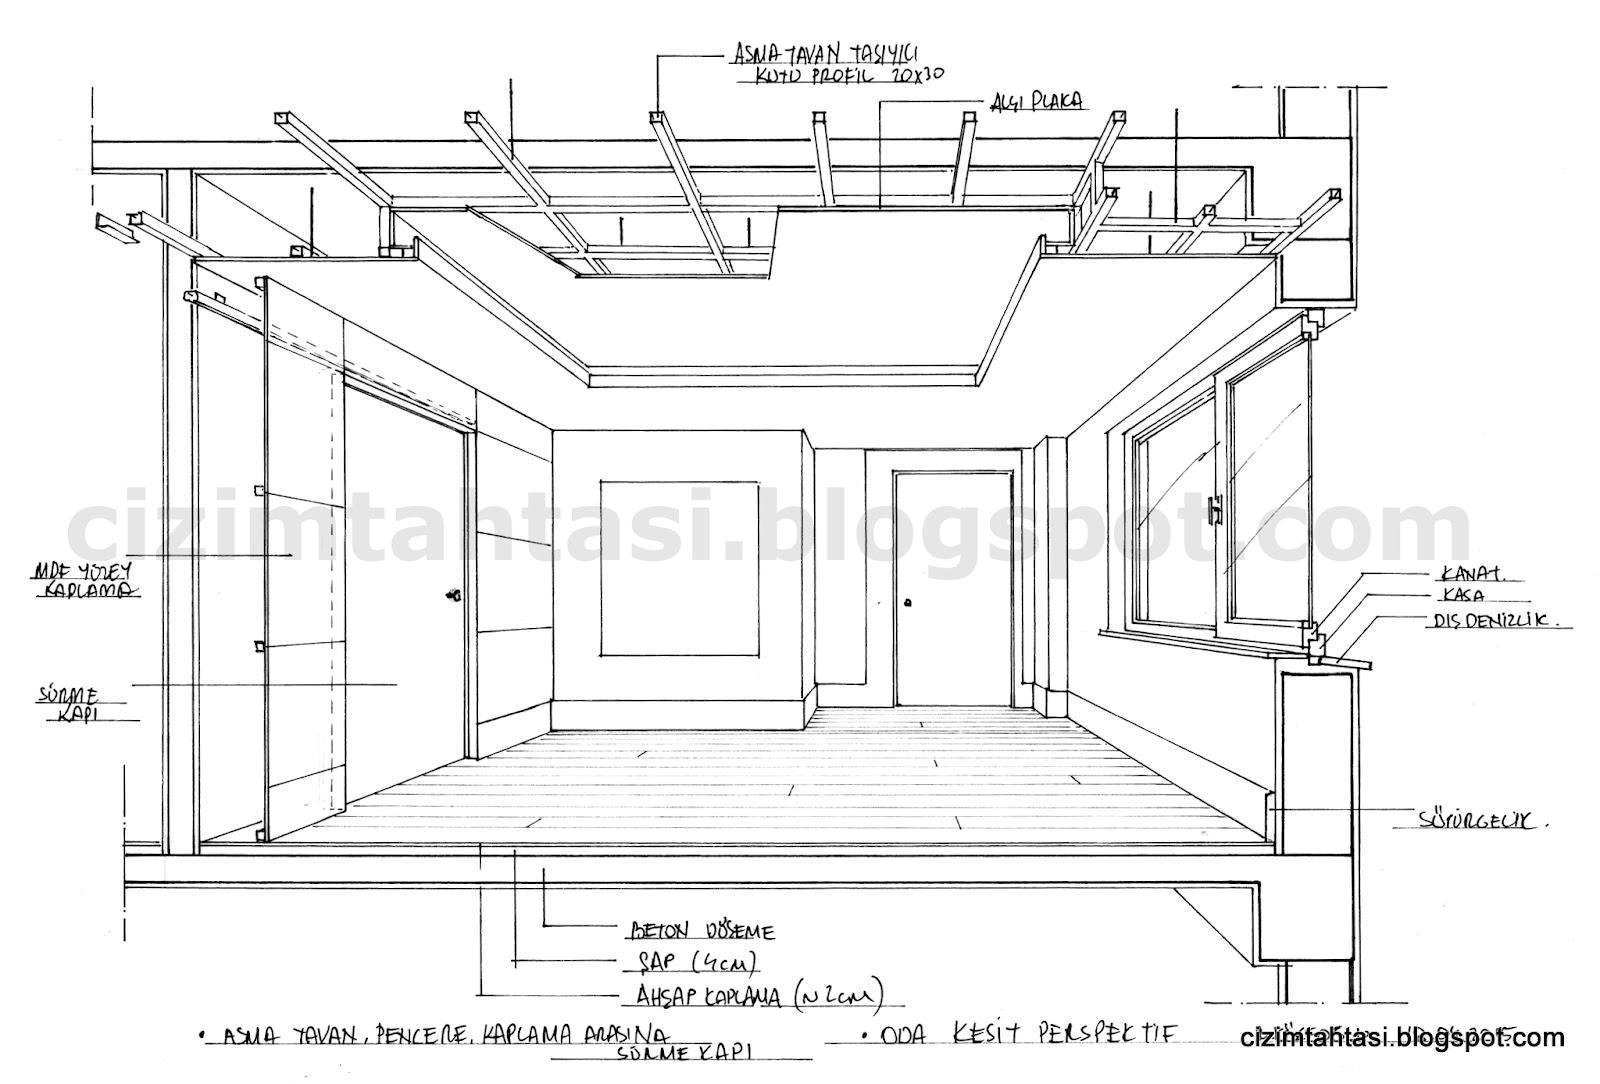 2015 04 01 archive as well Main furthermore Kitchen Prices furthermore Portre Bas Cizimi additionally Autocad Perspektif Cizimleri. on perspektif